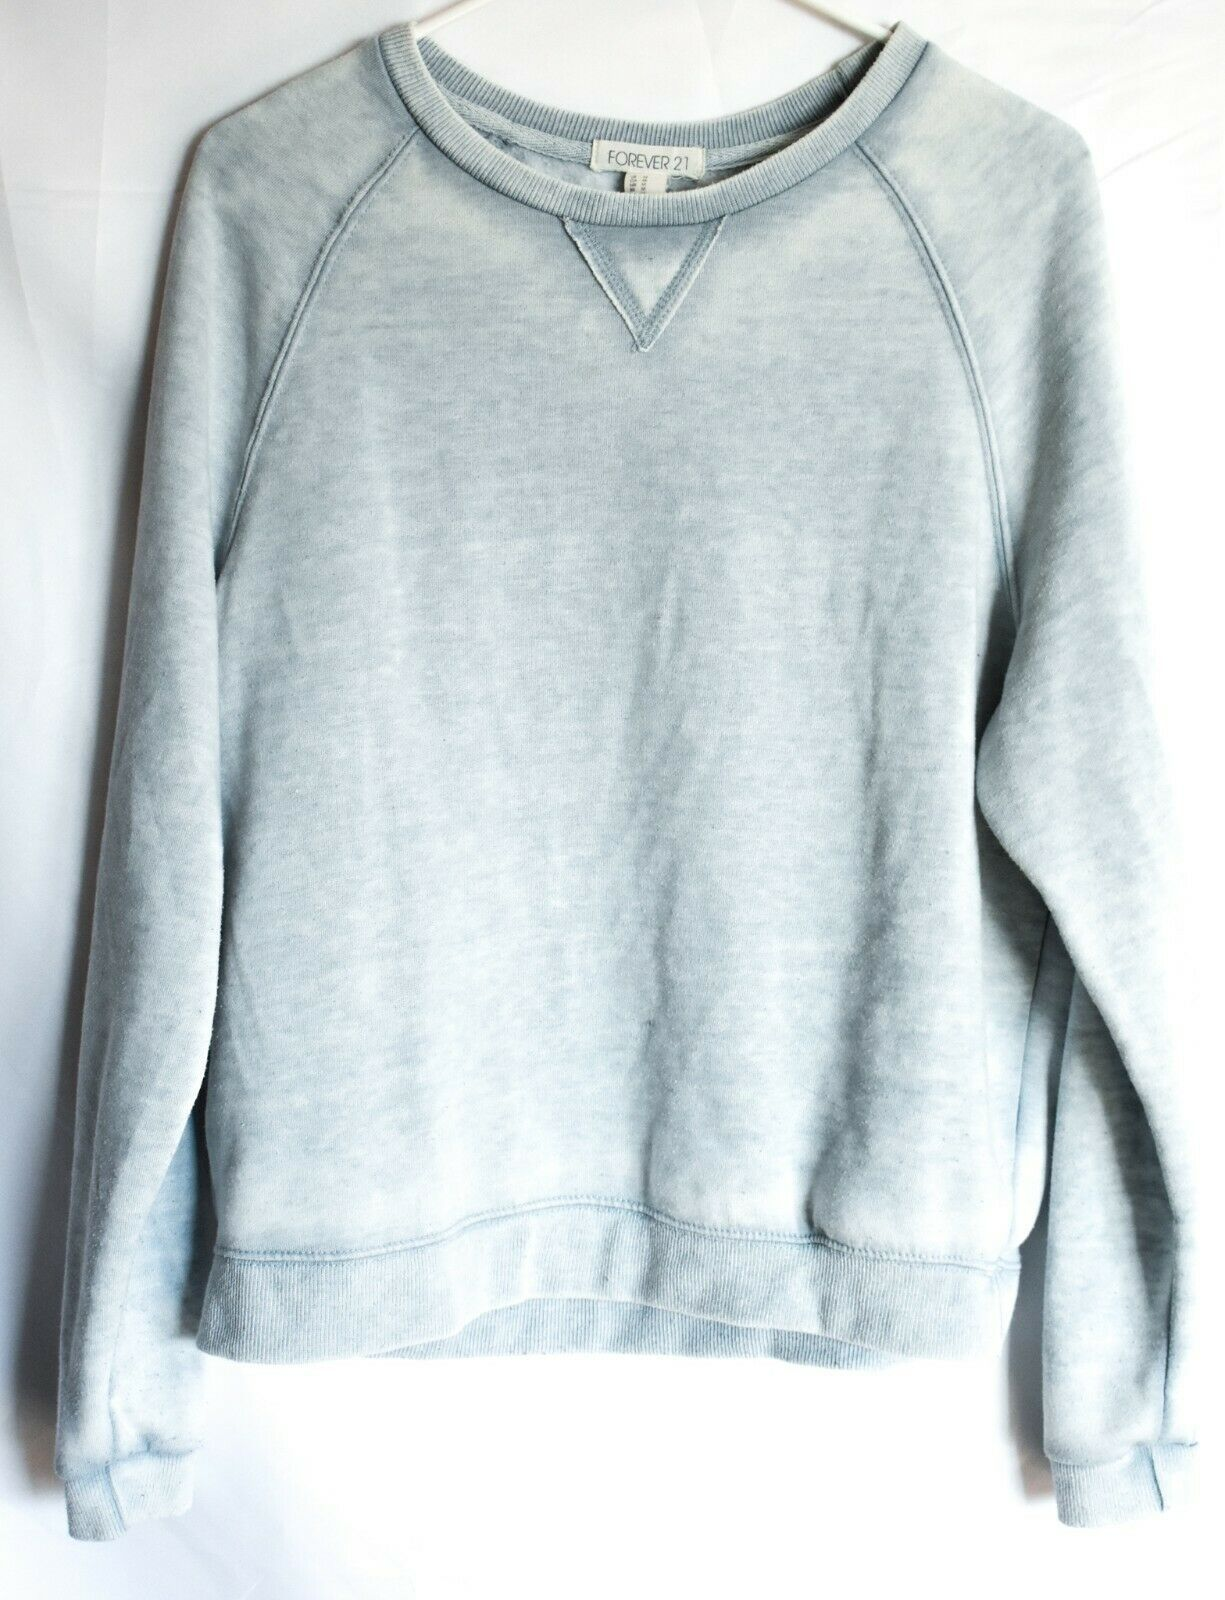 Forever 21 00137482 Faded Light Blue Long Sleeve Sweatshirt Size M